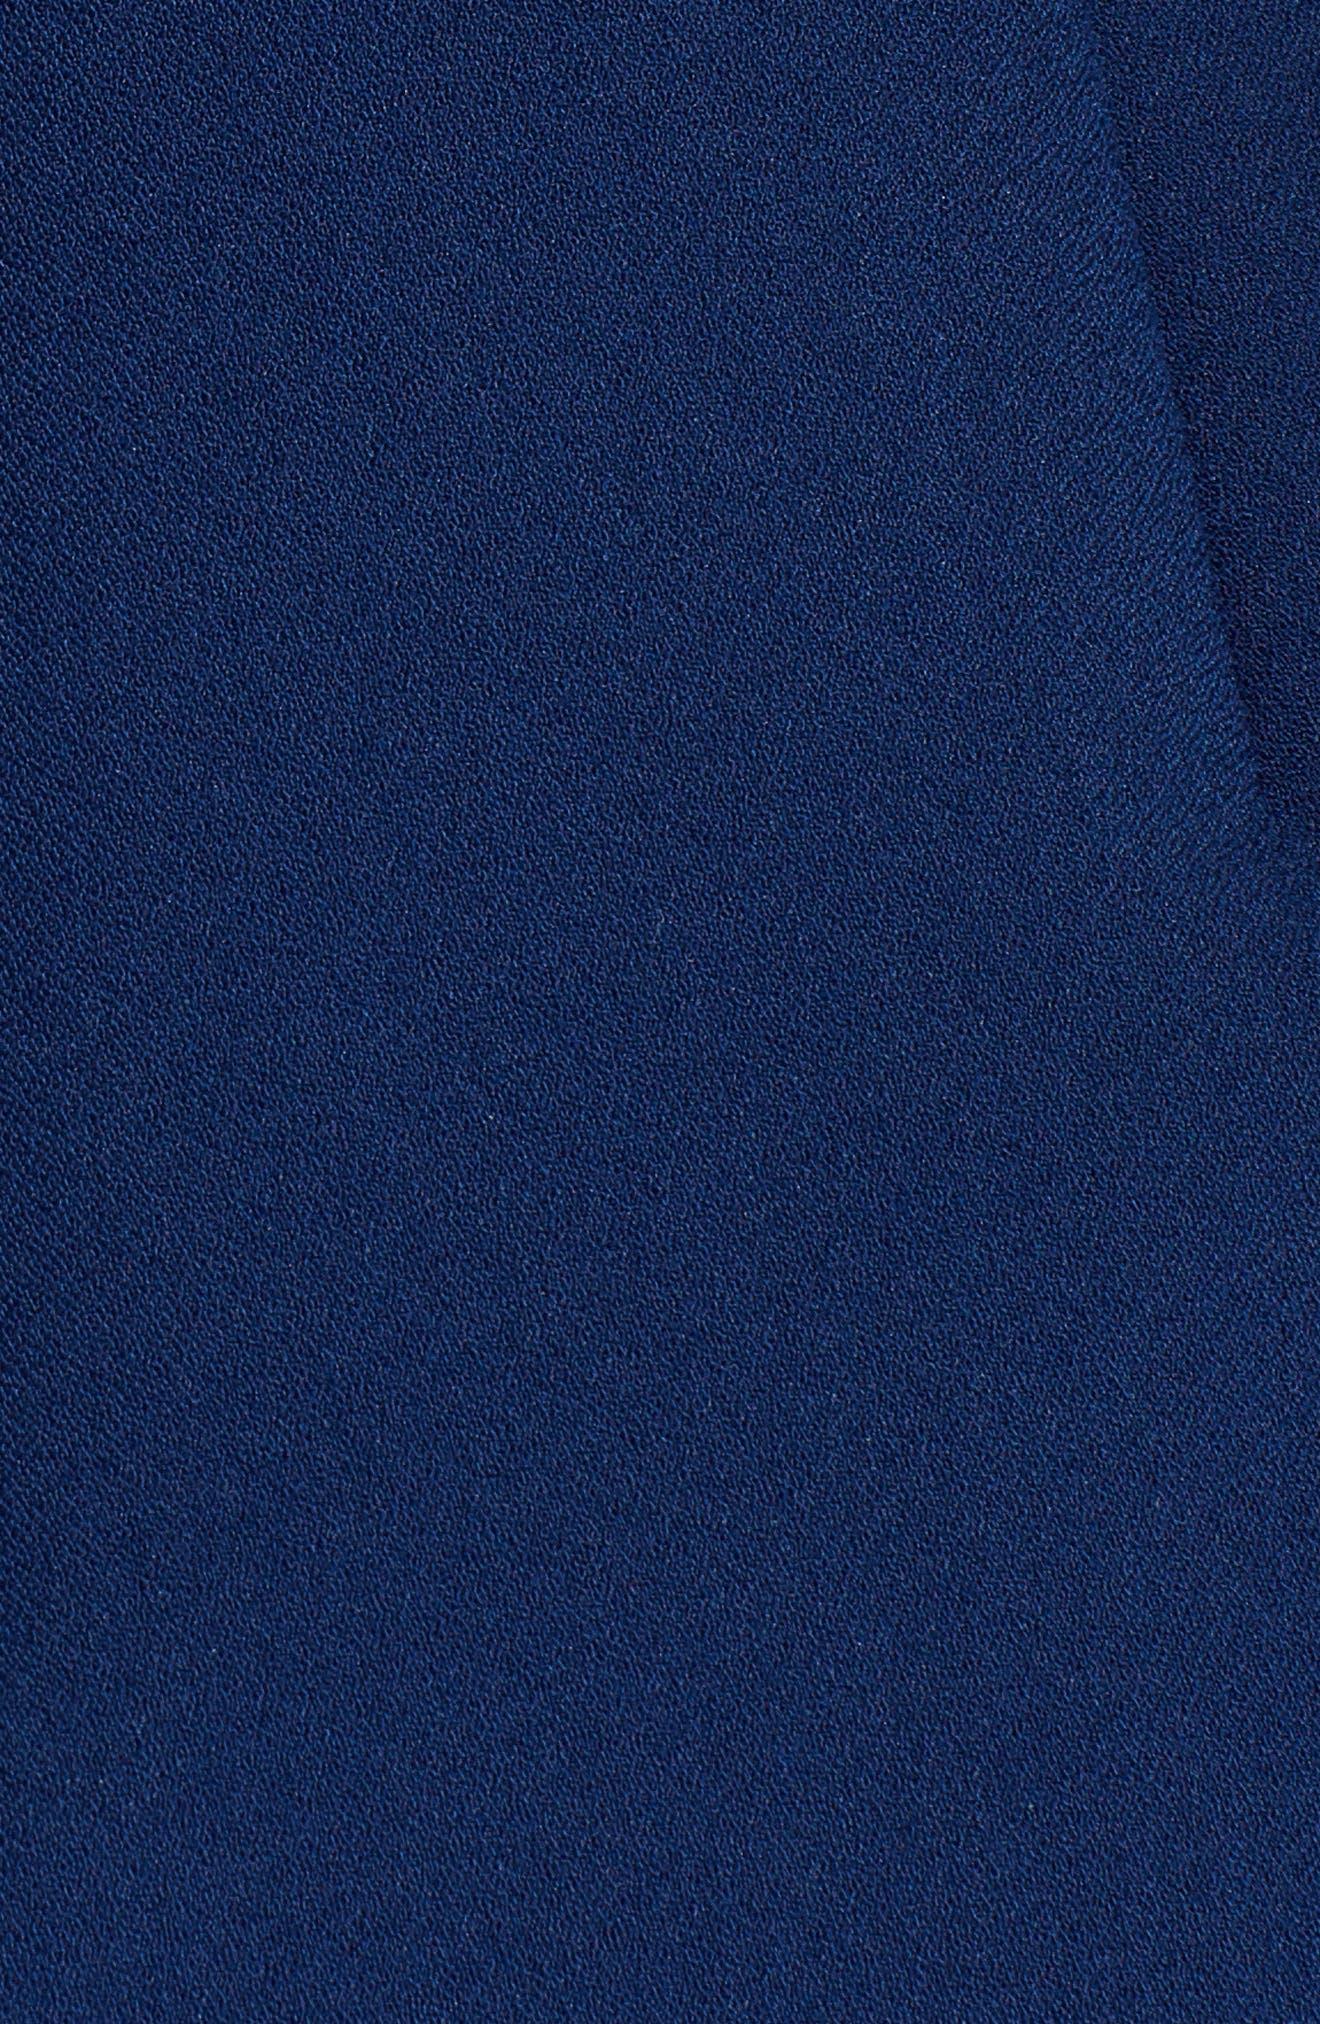 Ruffle Trim Dress,                             Alternate thumbnail 5, color,                             Navy 89